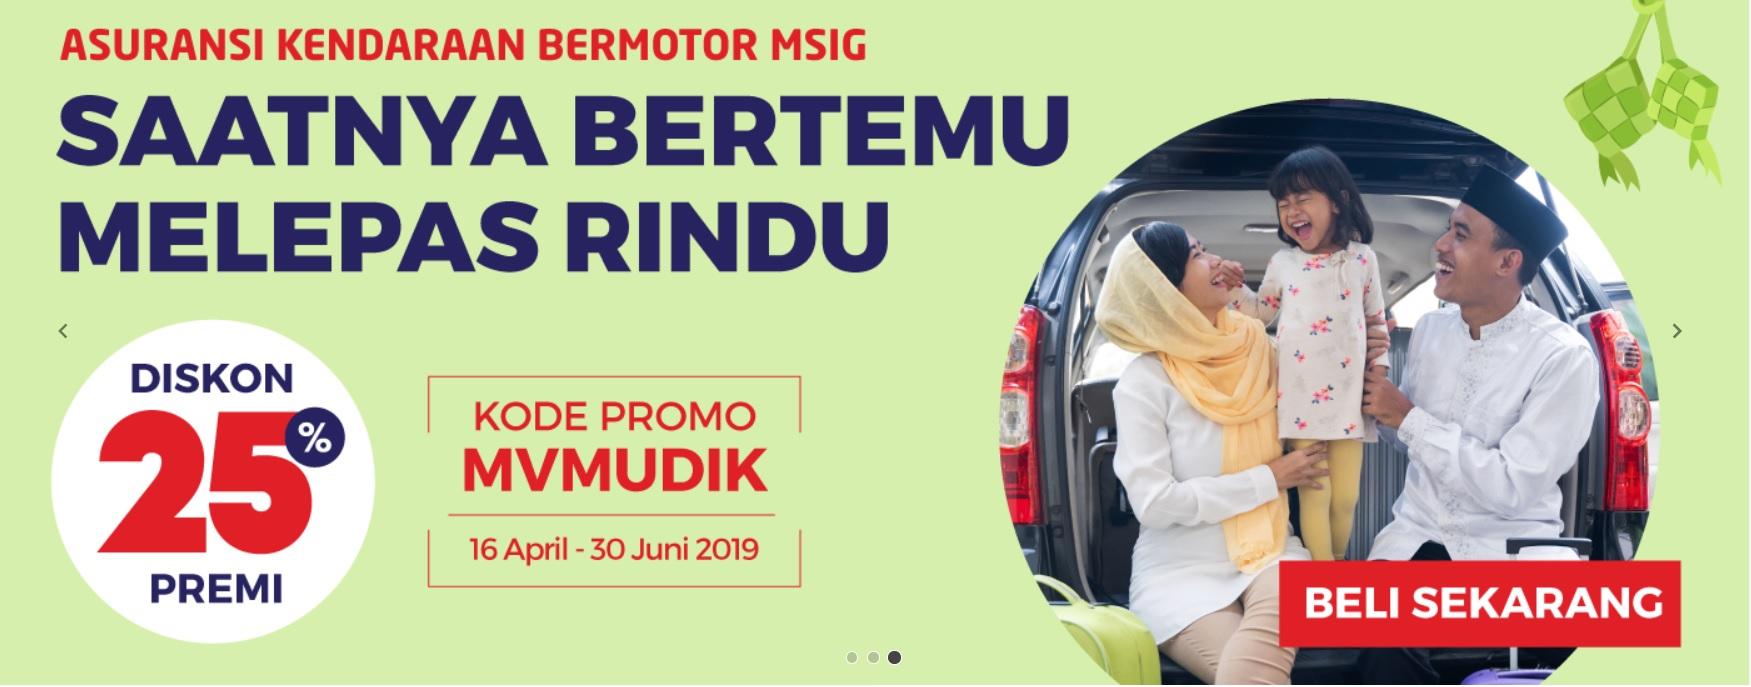 Asuransi Kendaraan MSIG, Berkendara Tanpa Cemas